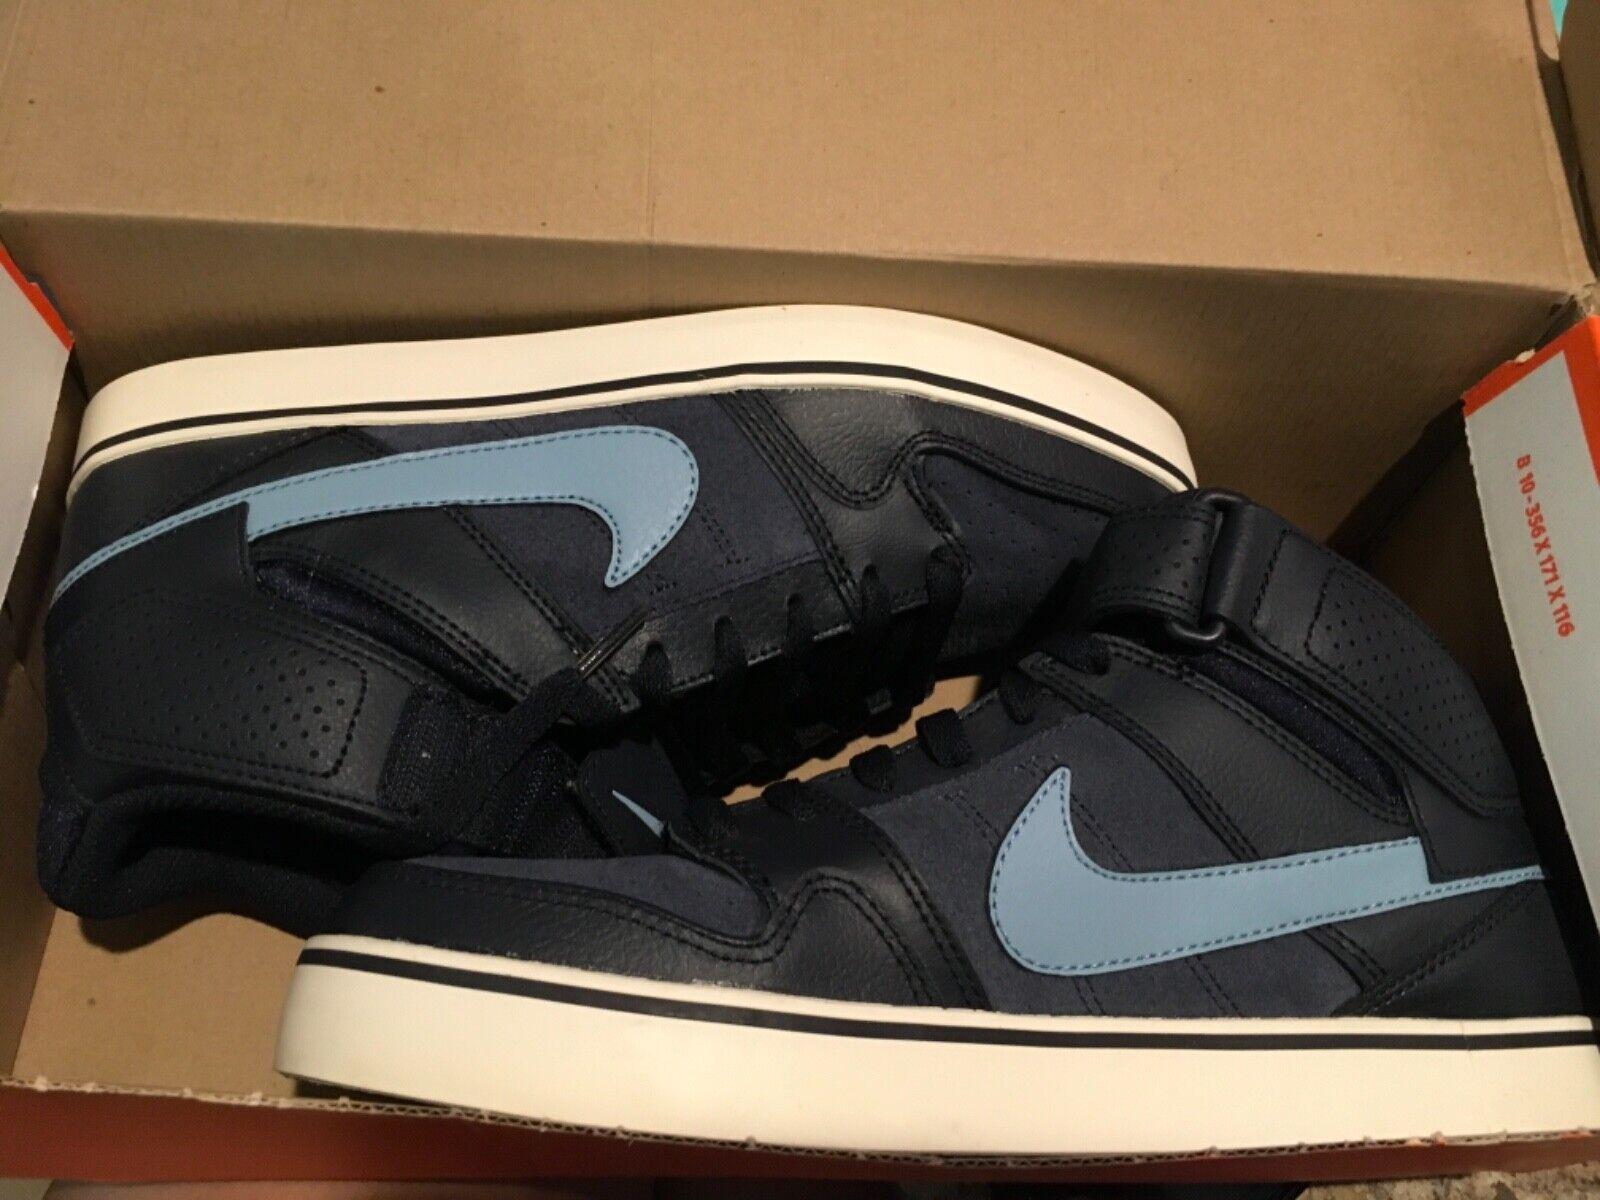 New Nike Mens sz 9 Mogan mid 2 SE Shoes 4487944-444 Sample! Obsidian navy blue